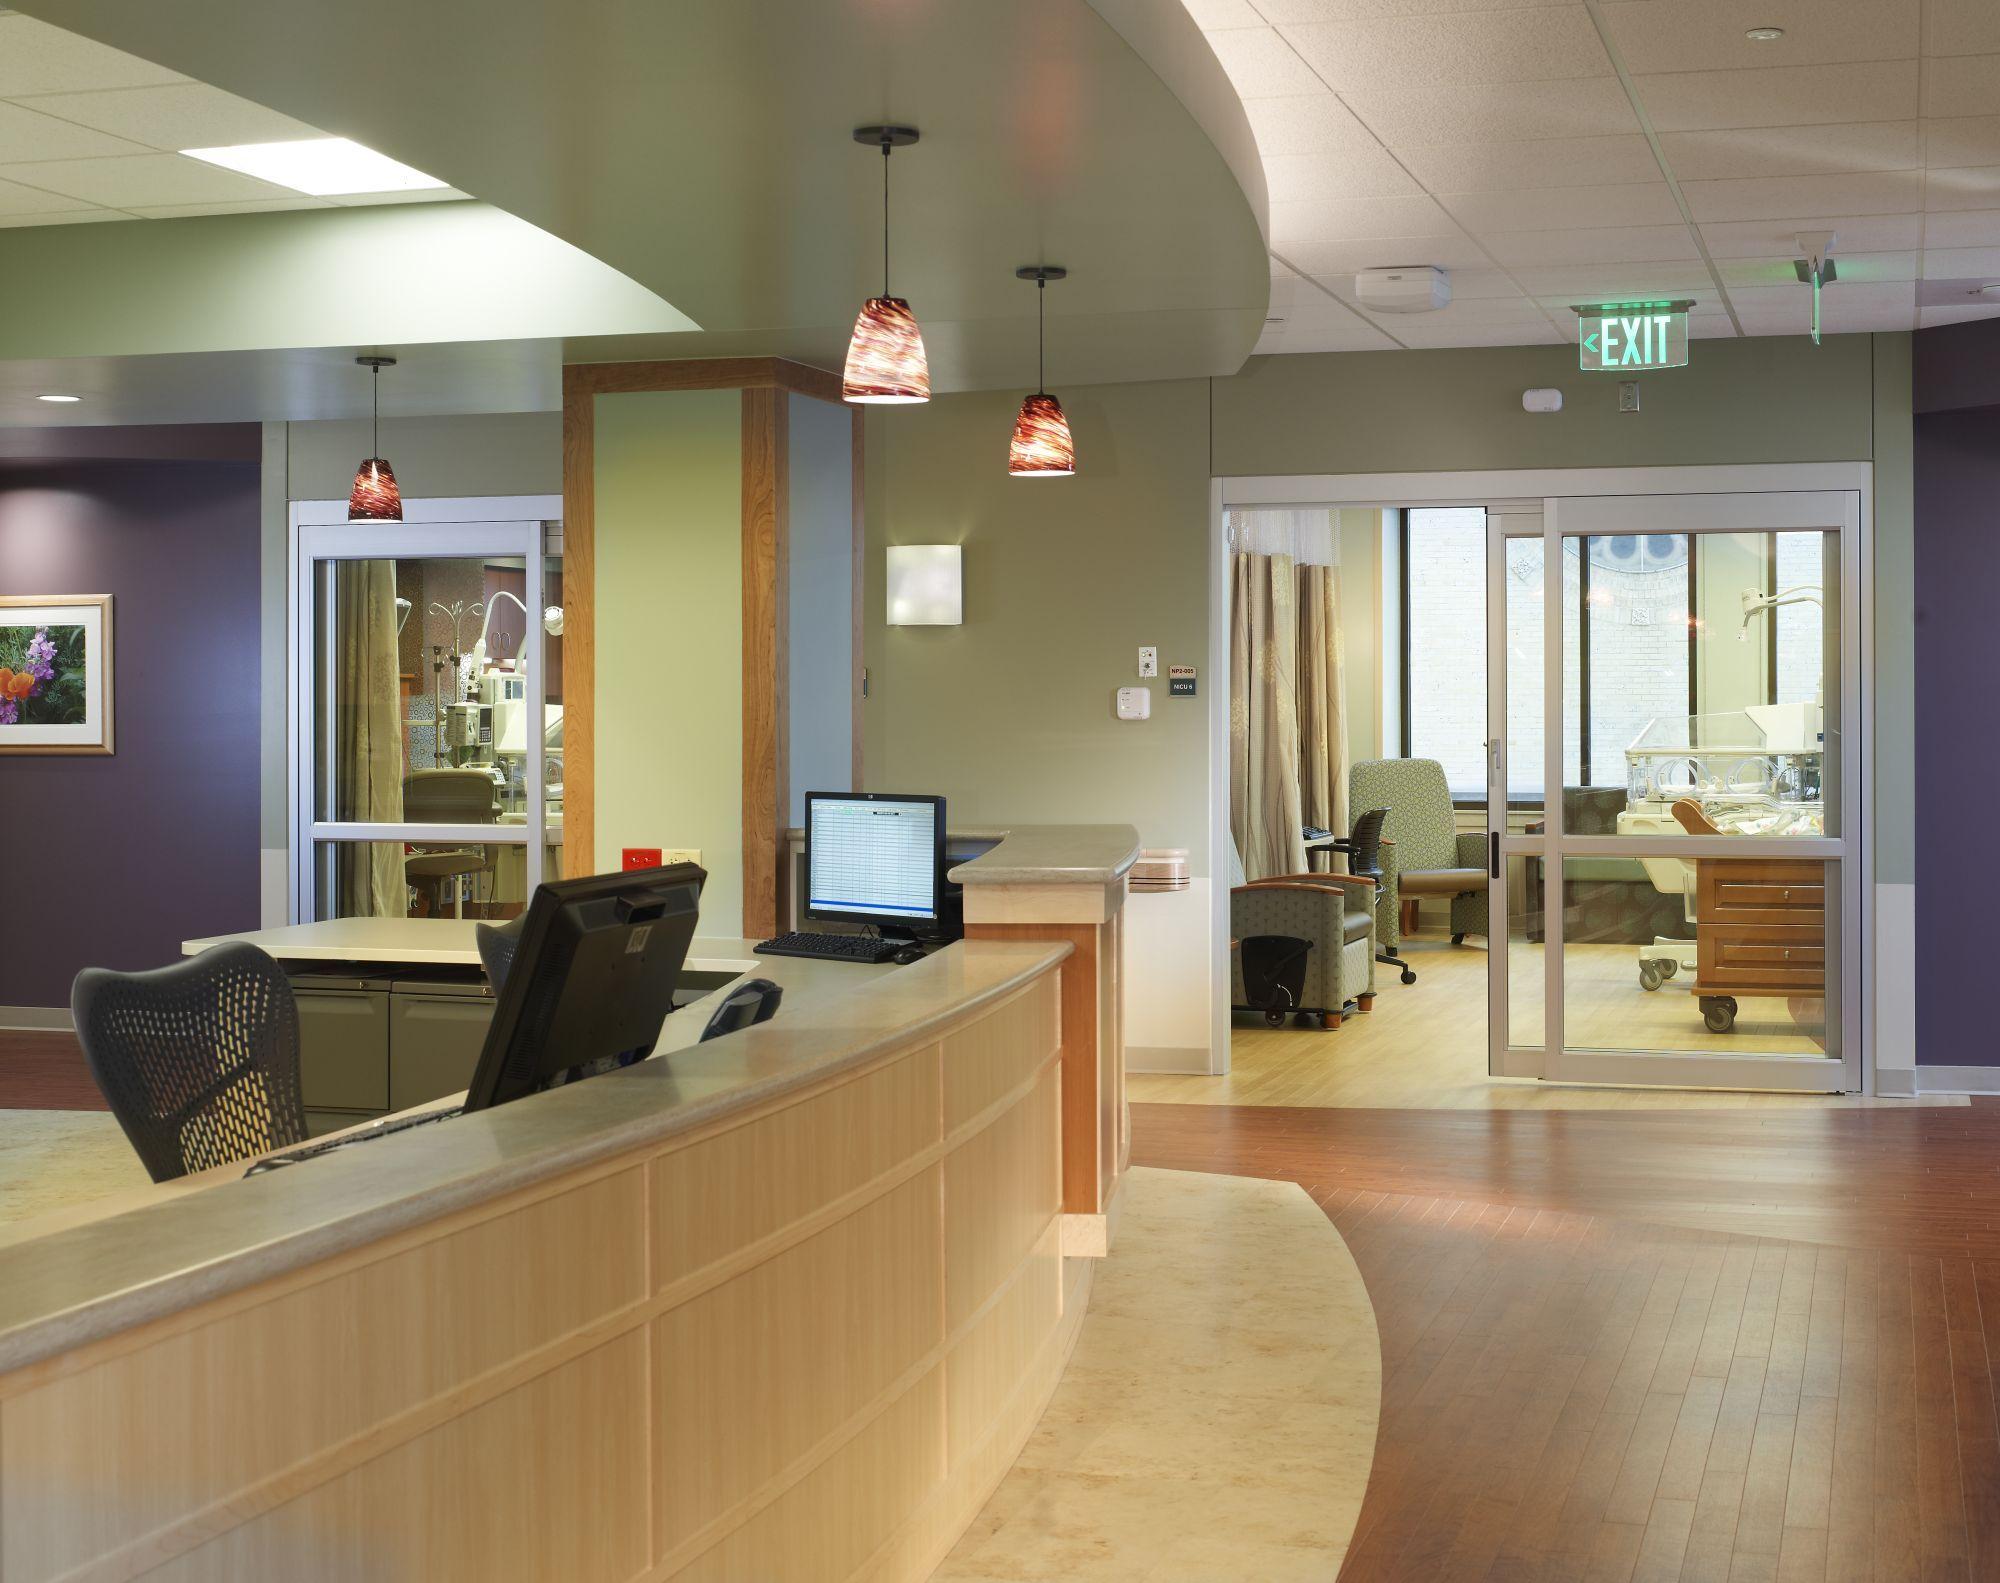 H+L Exempla Hospital  NICU Nurses Station 52mb - Copy.jpg